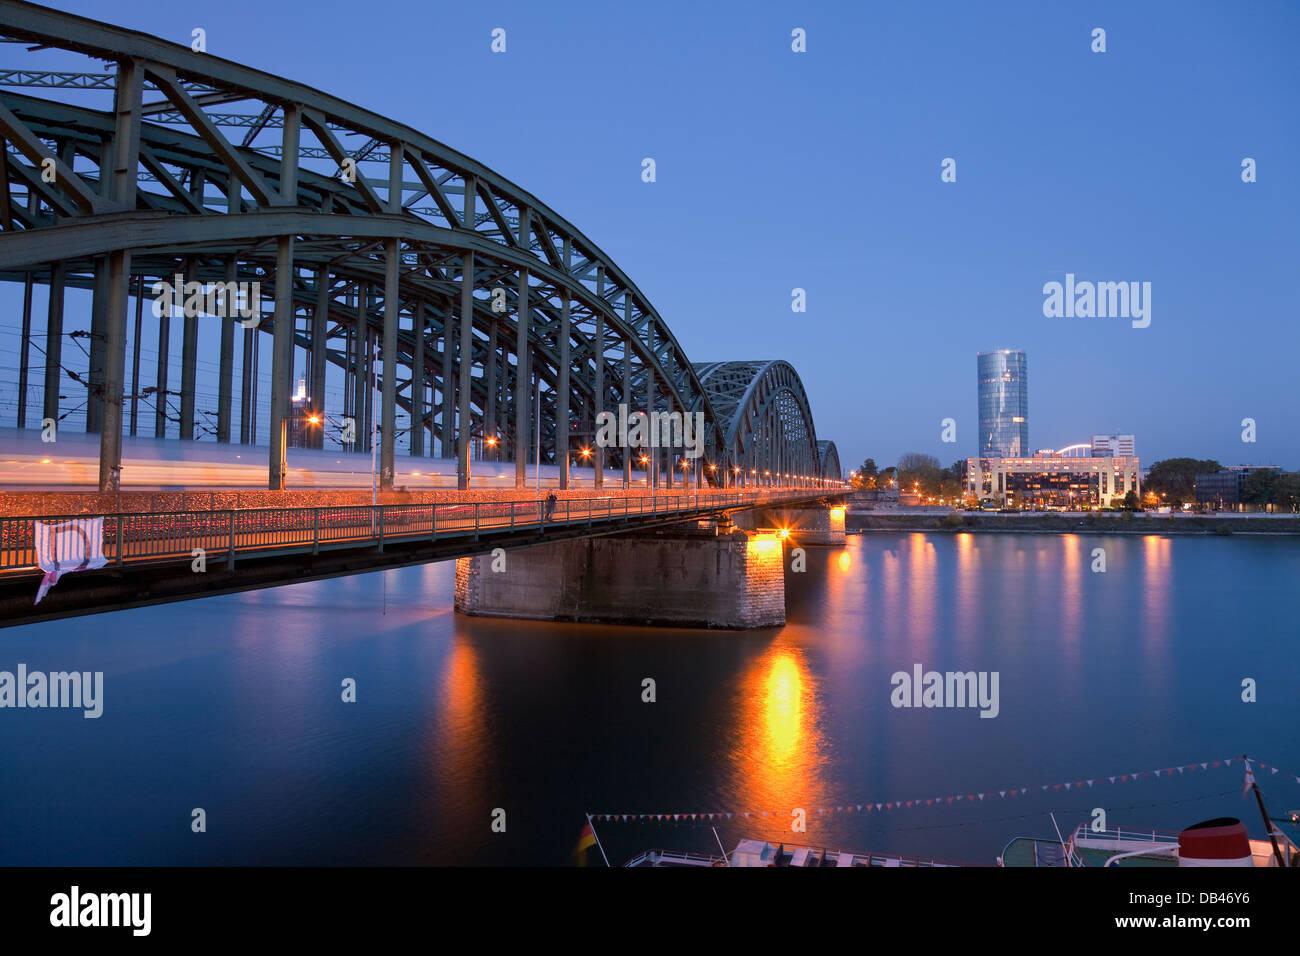 River Rhine and Hohenzollern Brucke (Bridge) at night, Cologne, Rhine-Westphalia, Germany Stock Photo